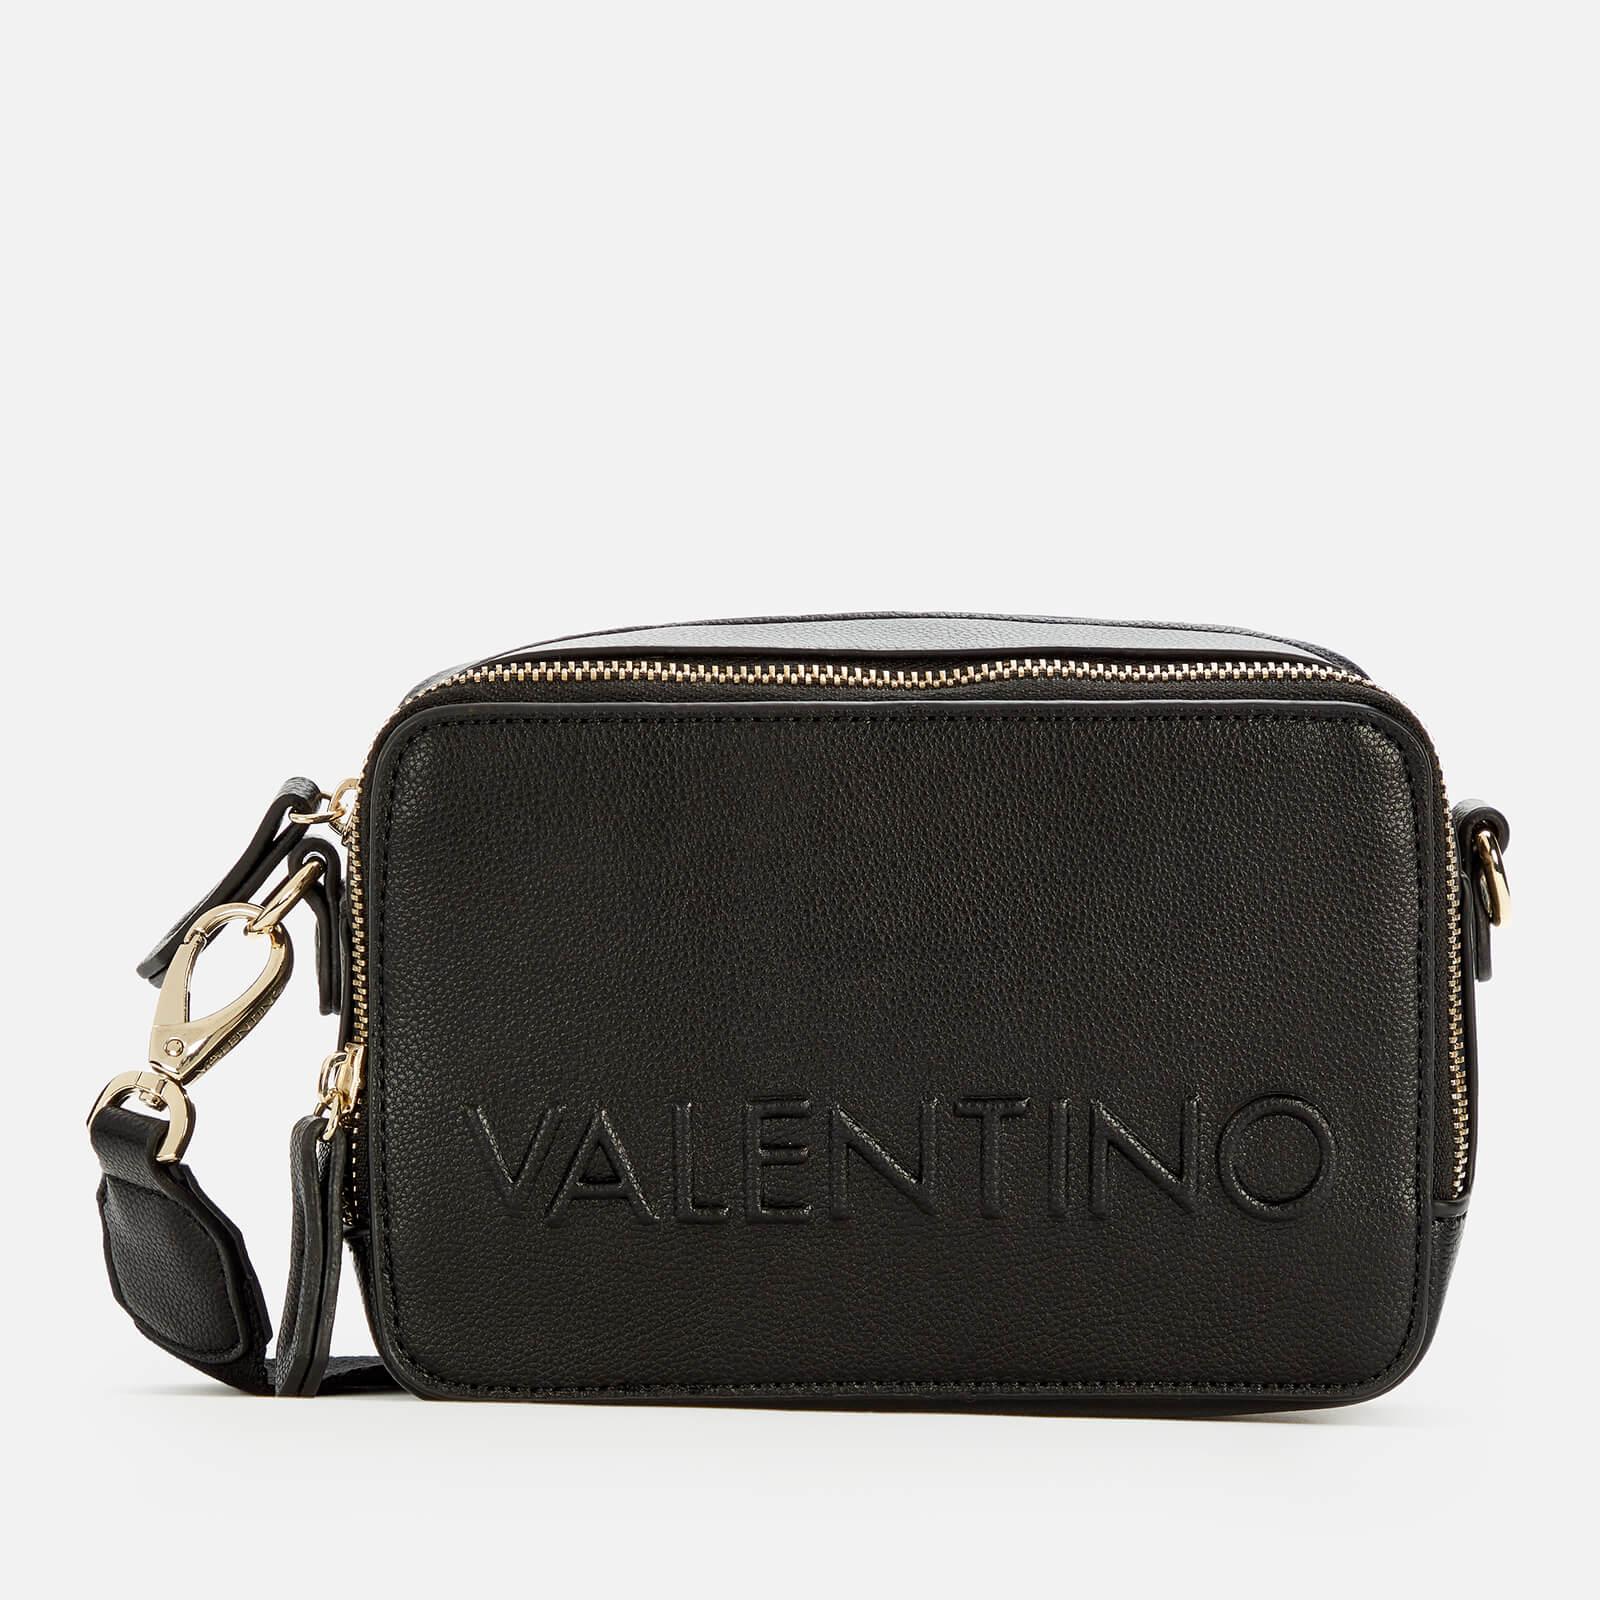 Valentino Bags Women's Prunus Cross Body Bag - Black